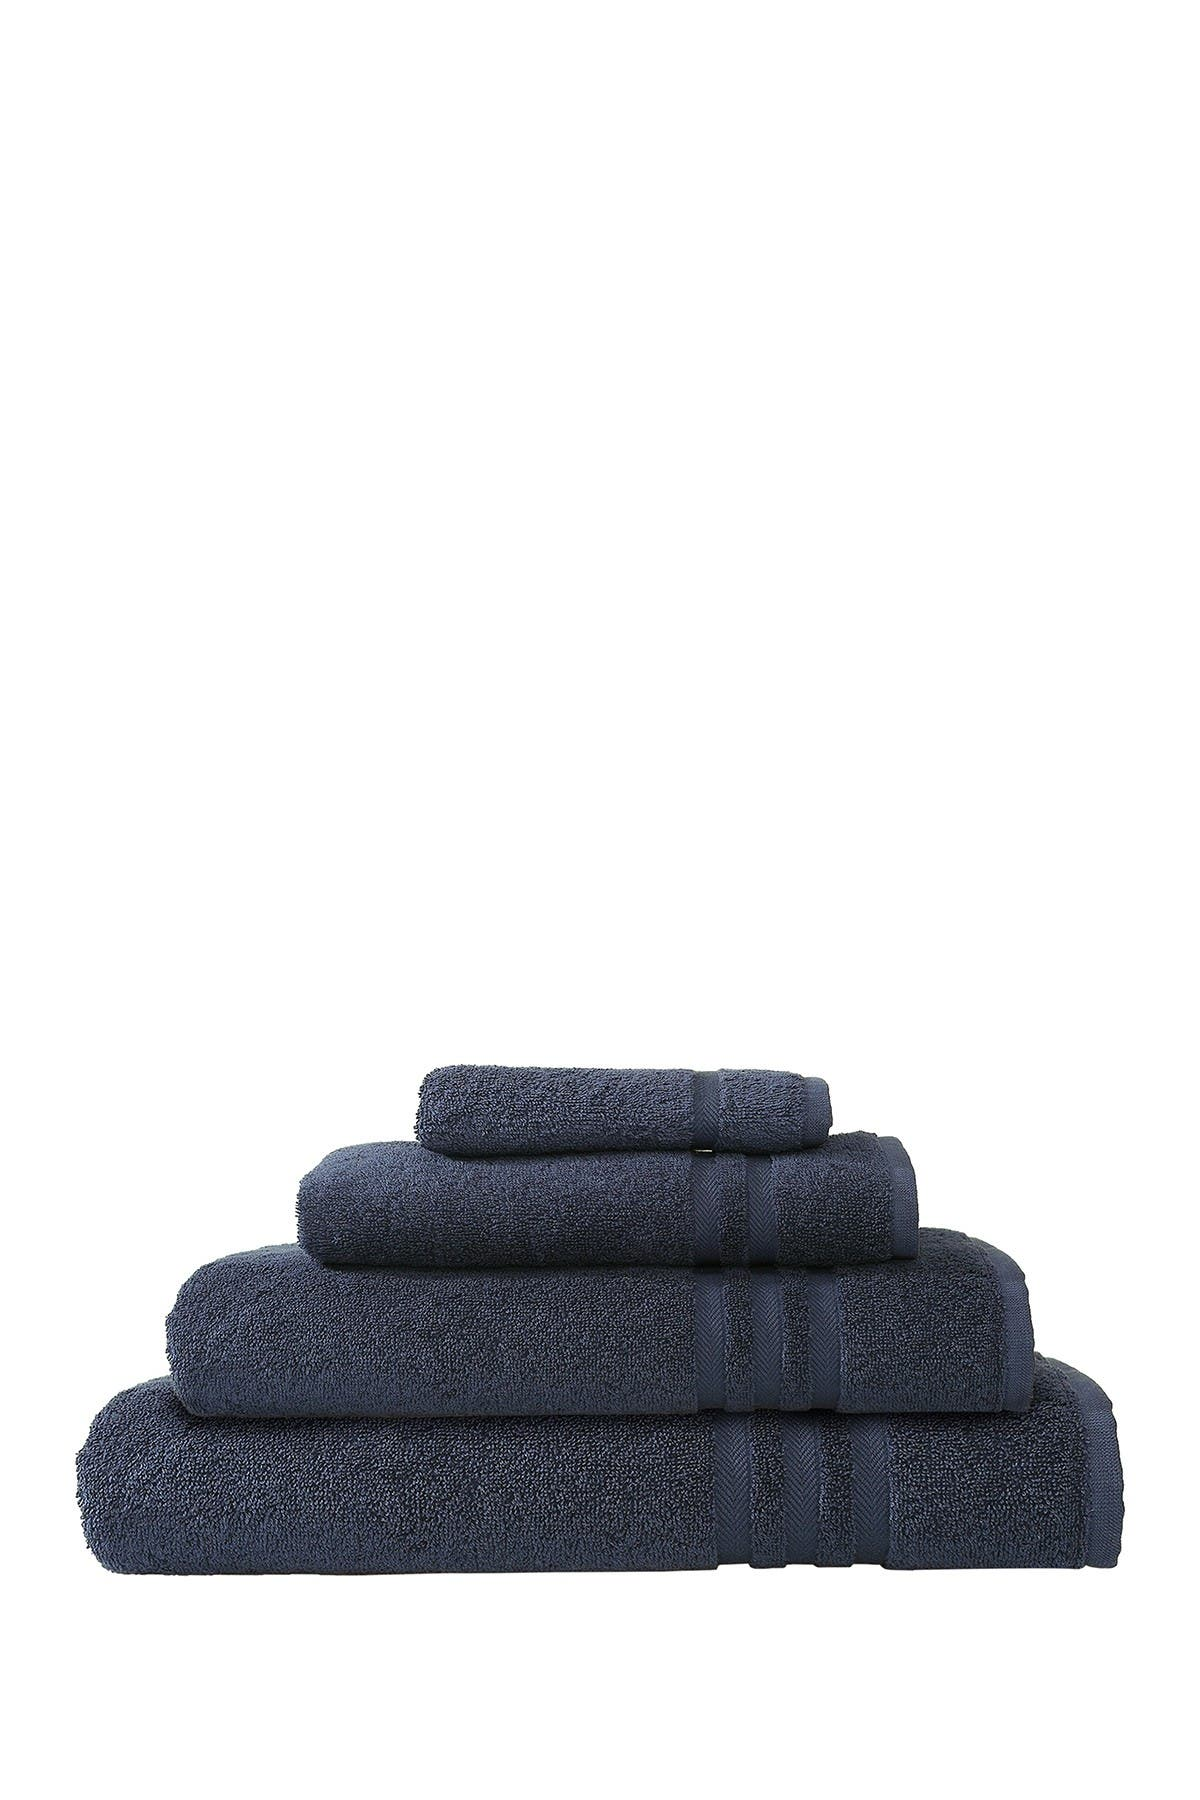 Image of LINUM HOME Denzi 4-Piece Towel Set - Twilight Blue